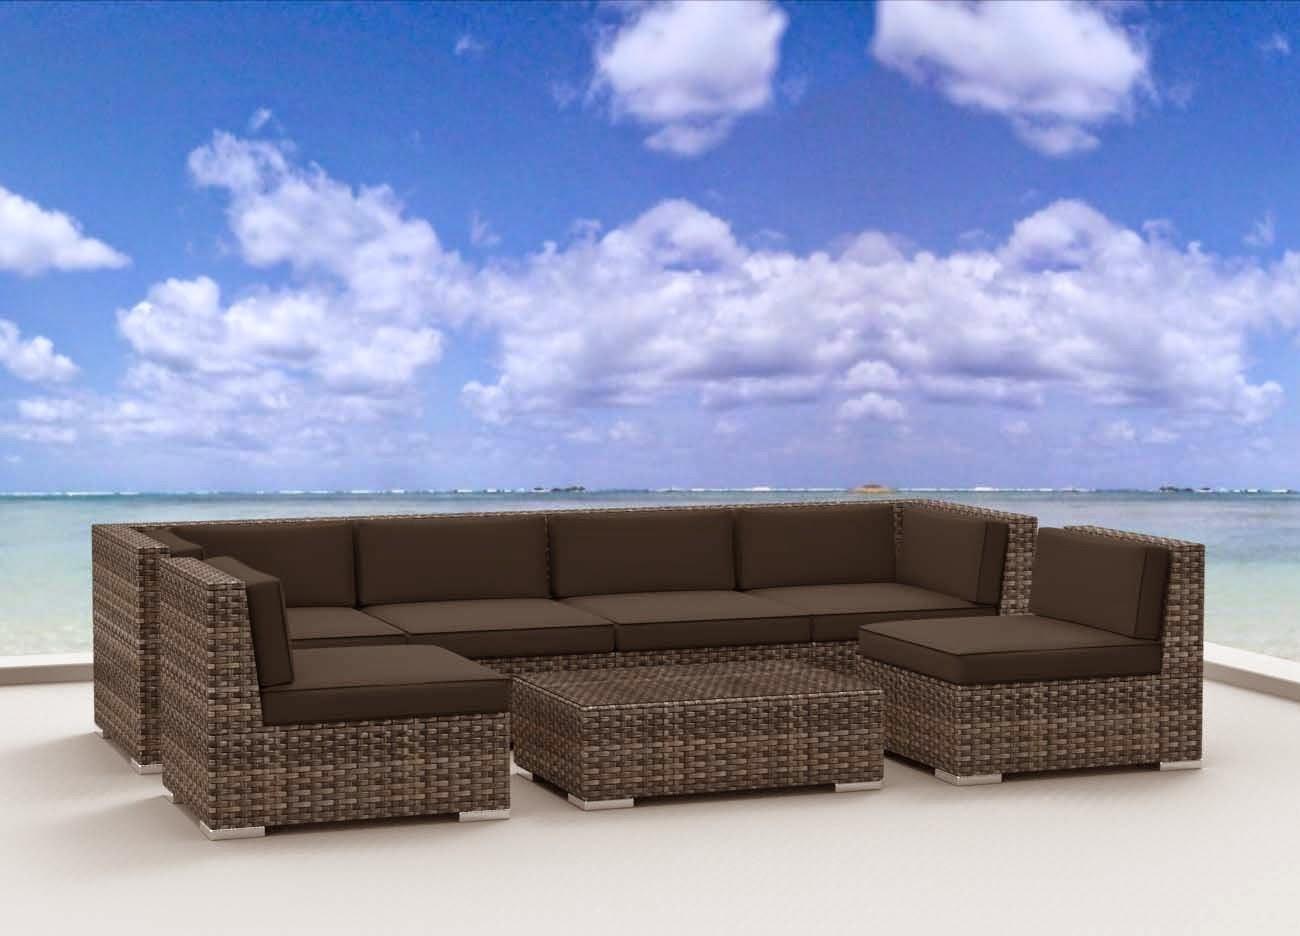 Urban Furnishing Modern Outdoor Backyard Wicker Rattan Patio With Modern Rattan Sofas (View 11 of 23)